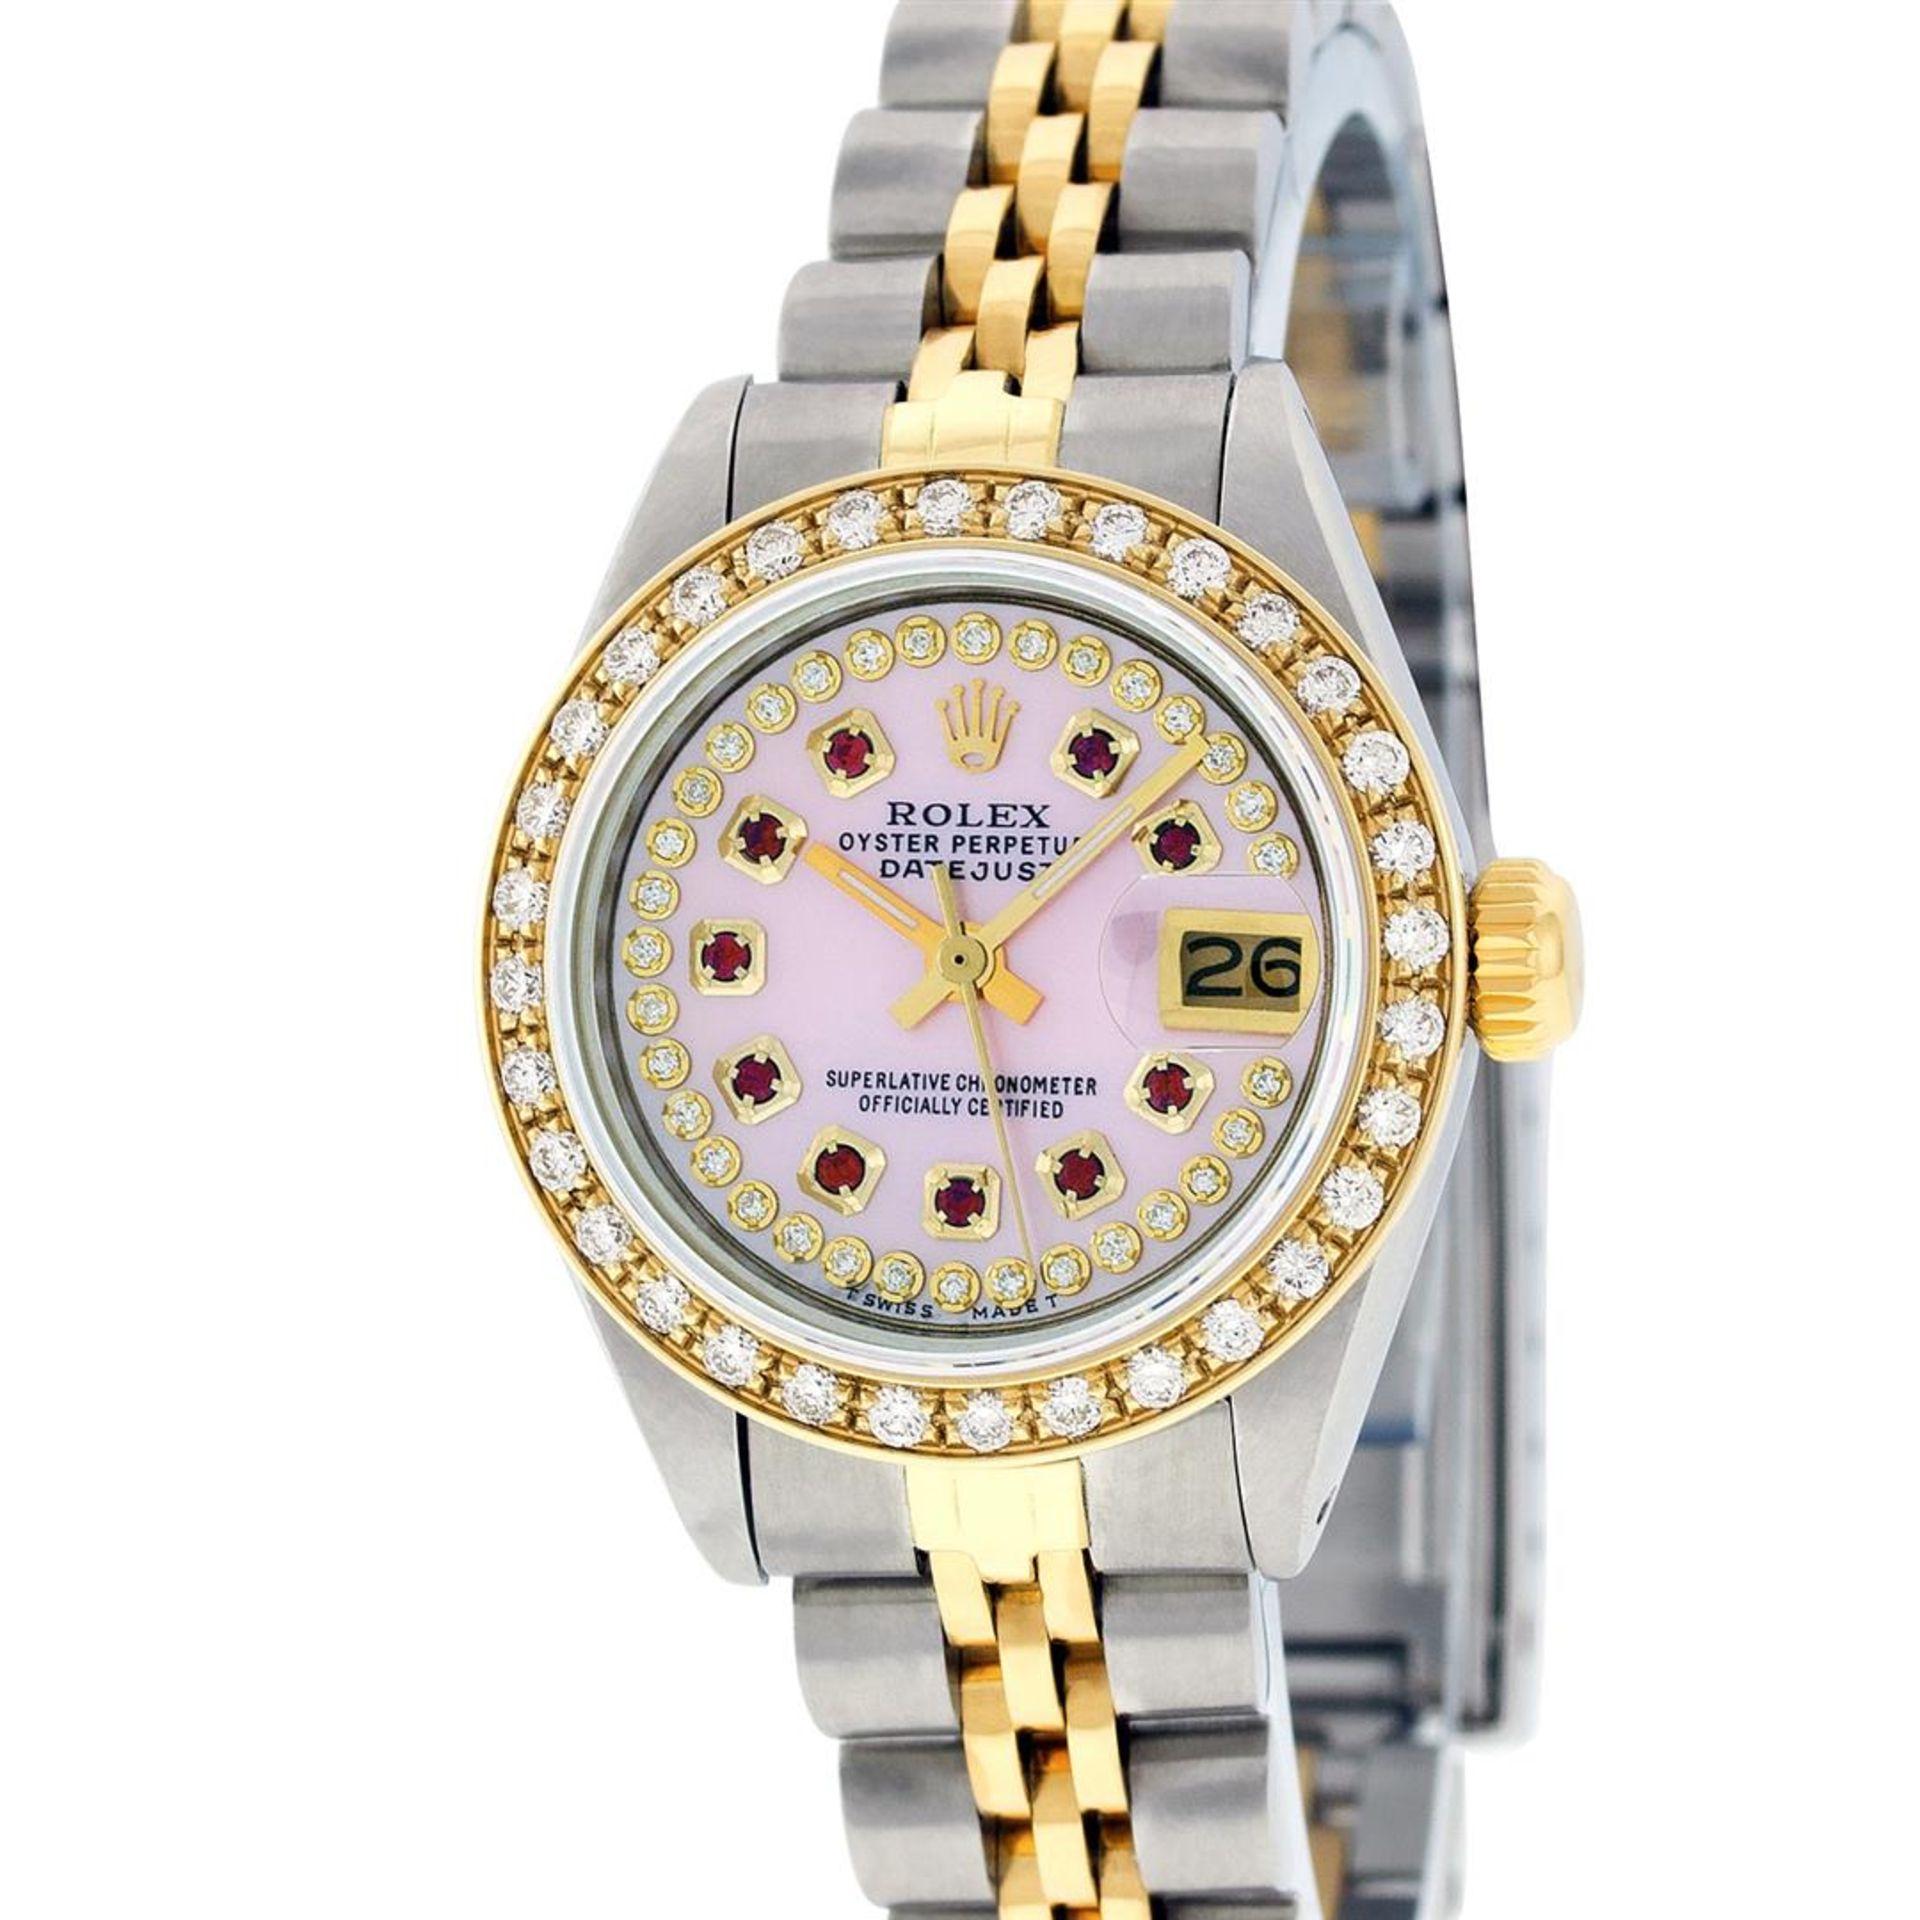 Rolex Ladies 2 Tone Pink MOP Ruby String Diamond Datejust Wristwatch - Image 2 of 9